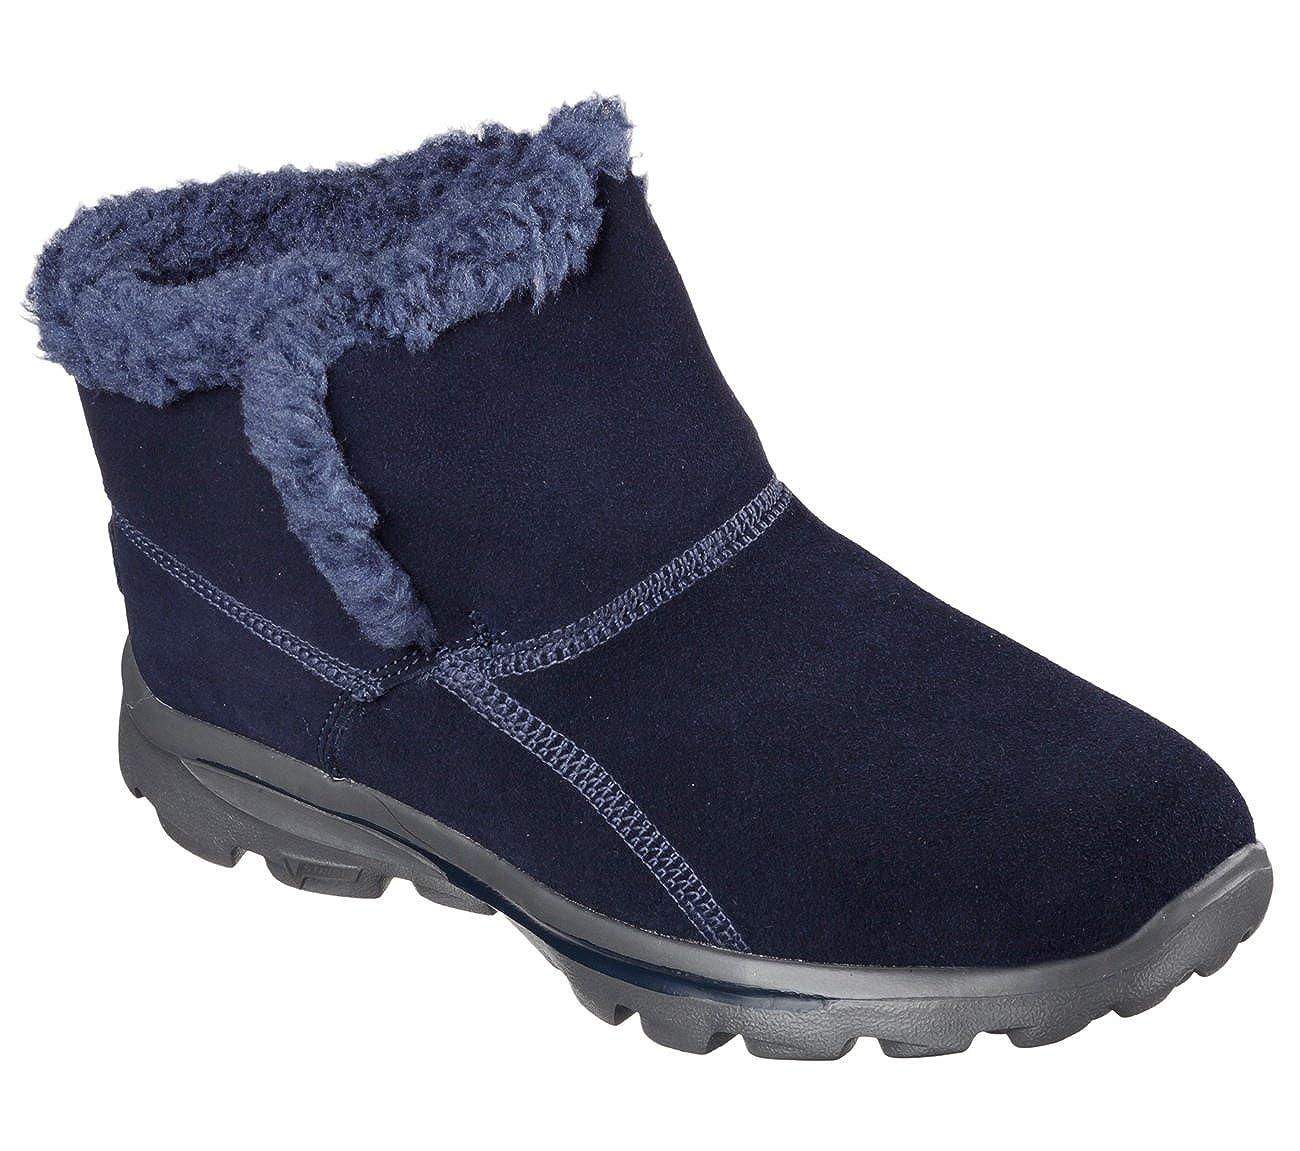 skechers on the go chugga boots